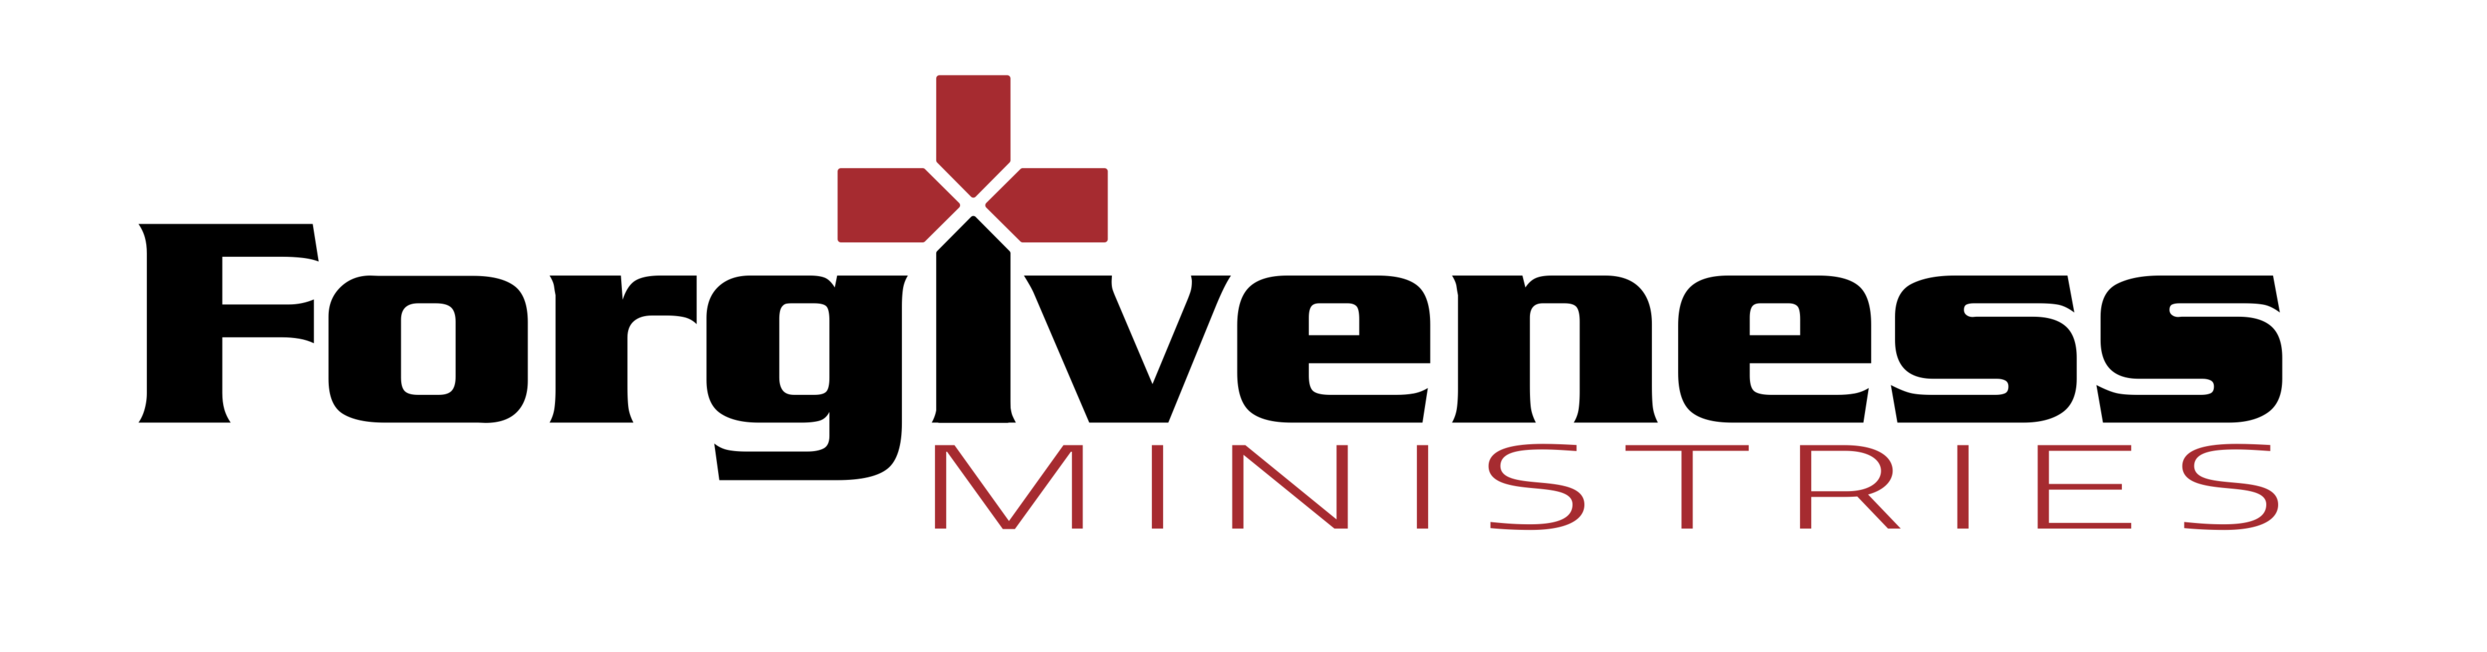 forgiveness ministries logo.png